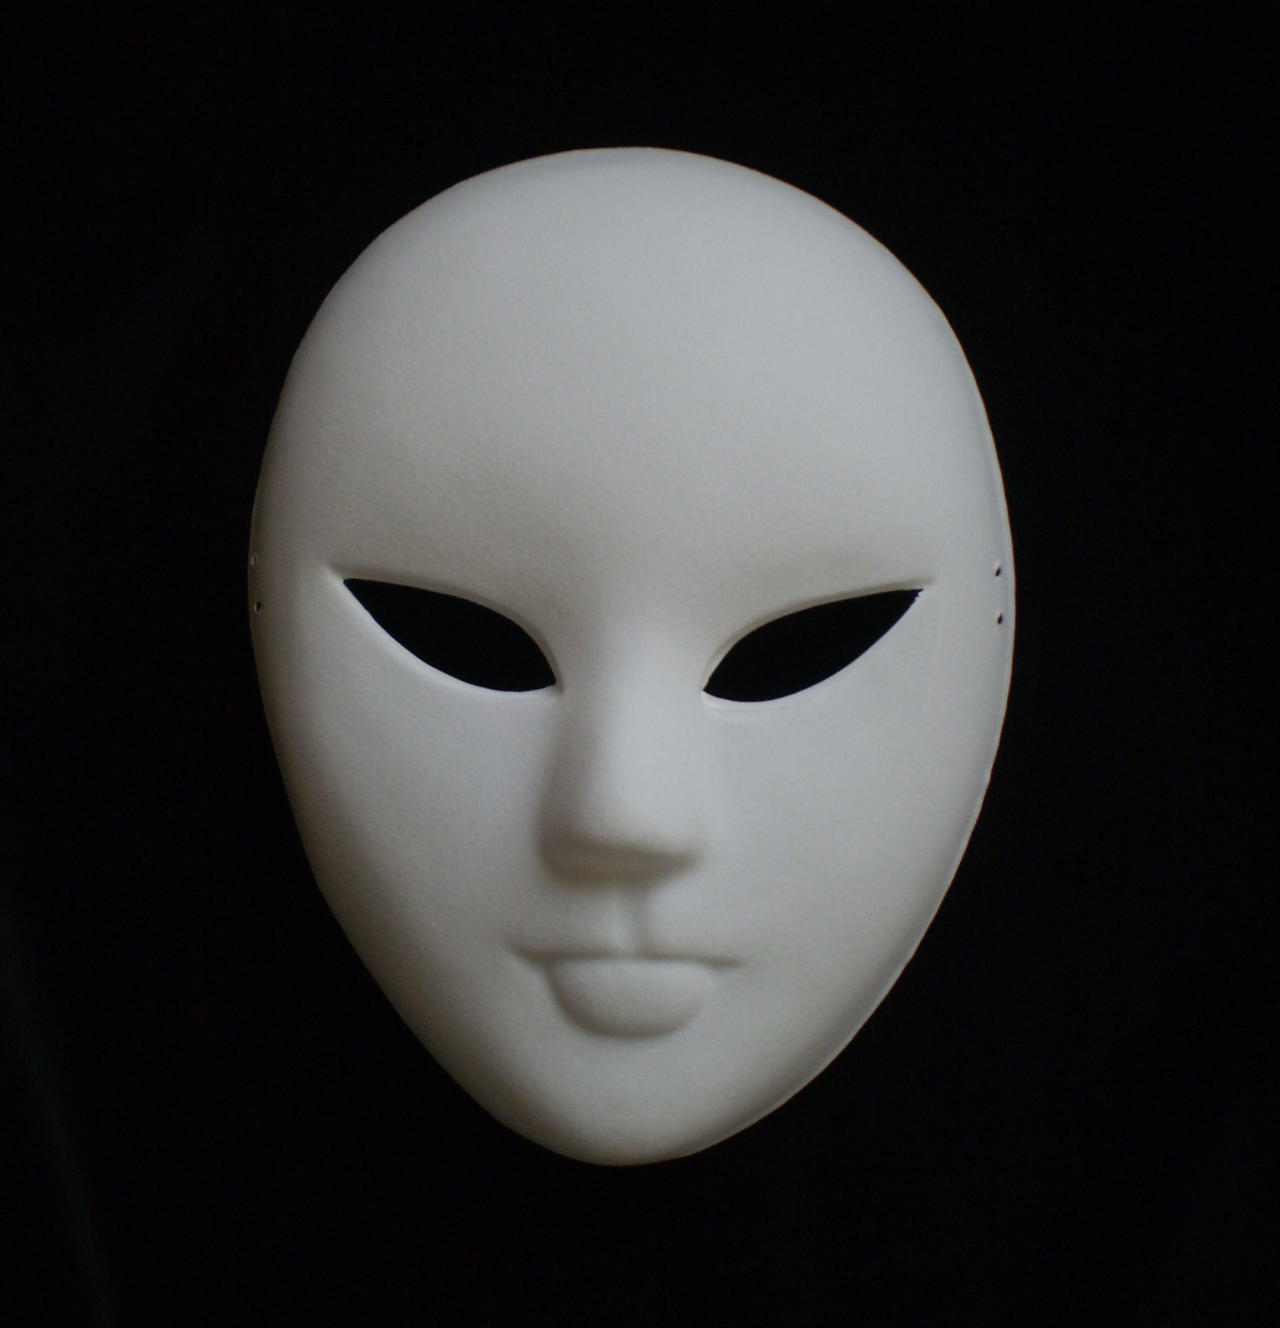 Plain White Mask Stock By MDFS Mask